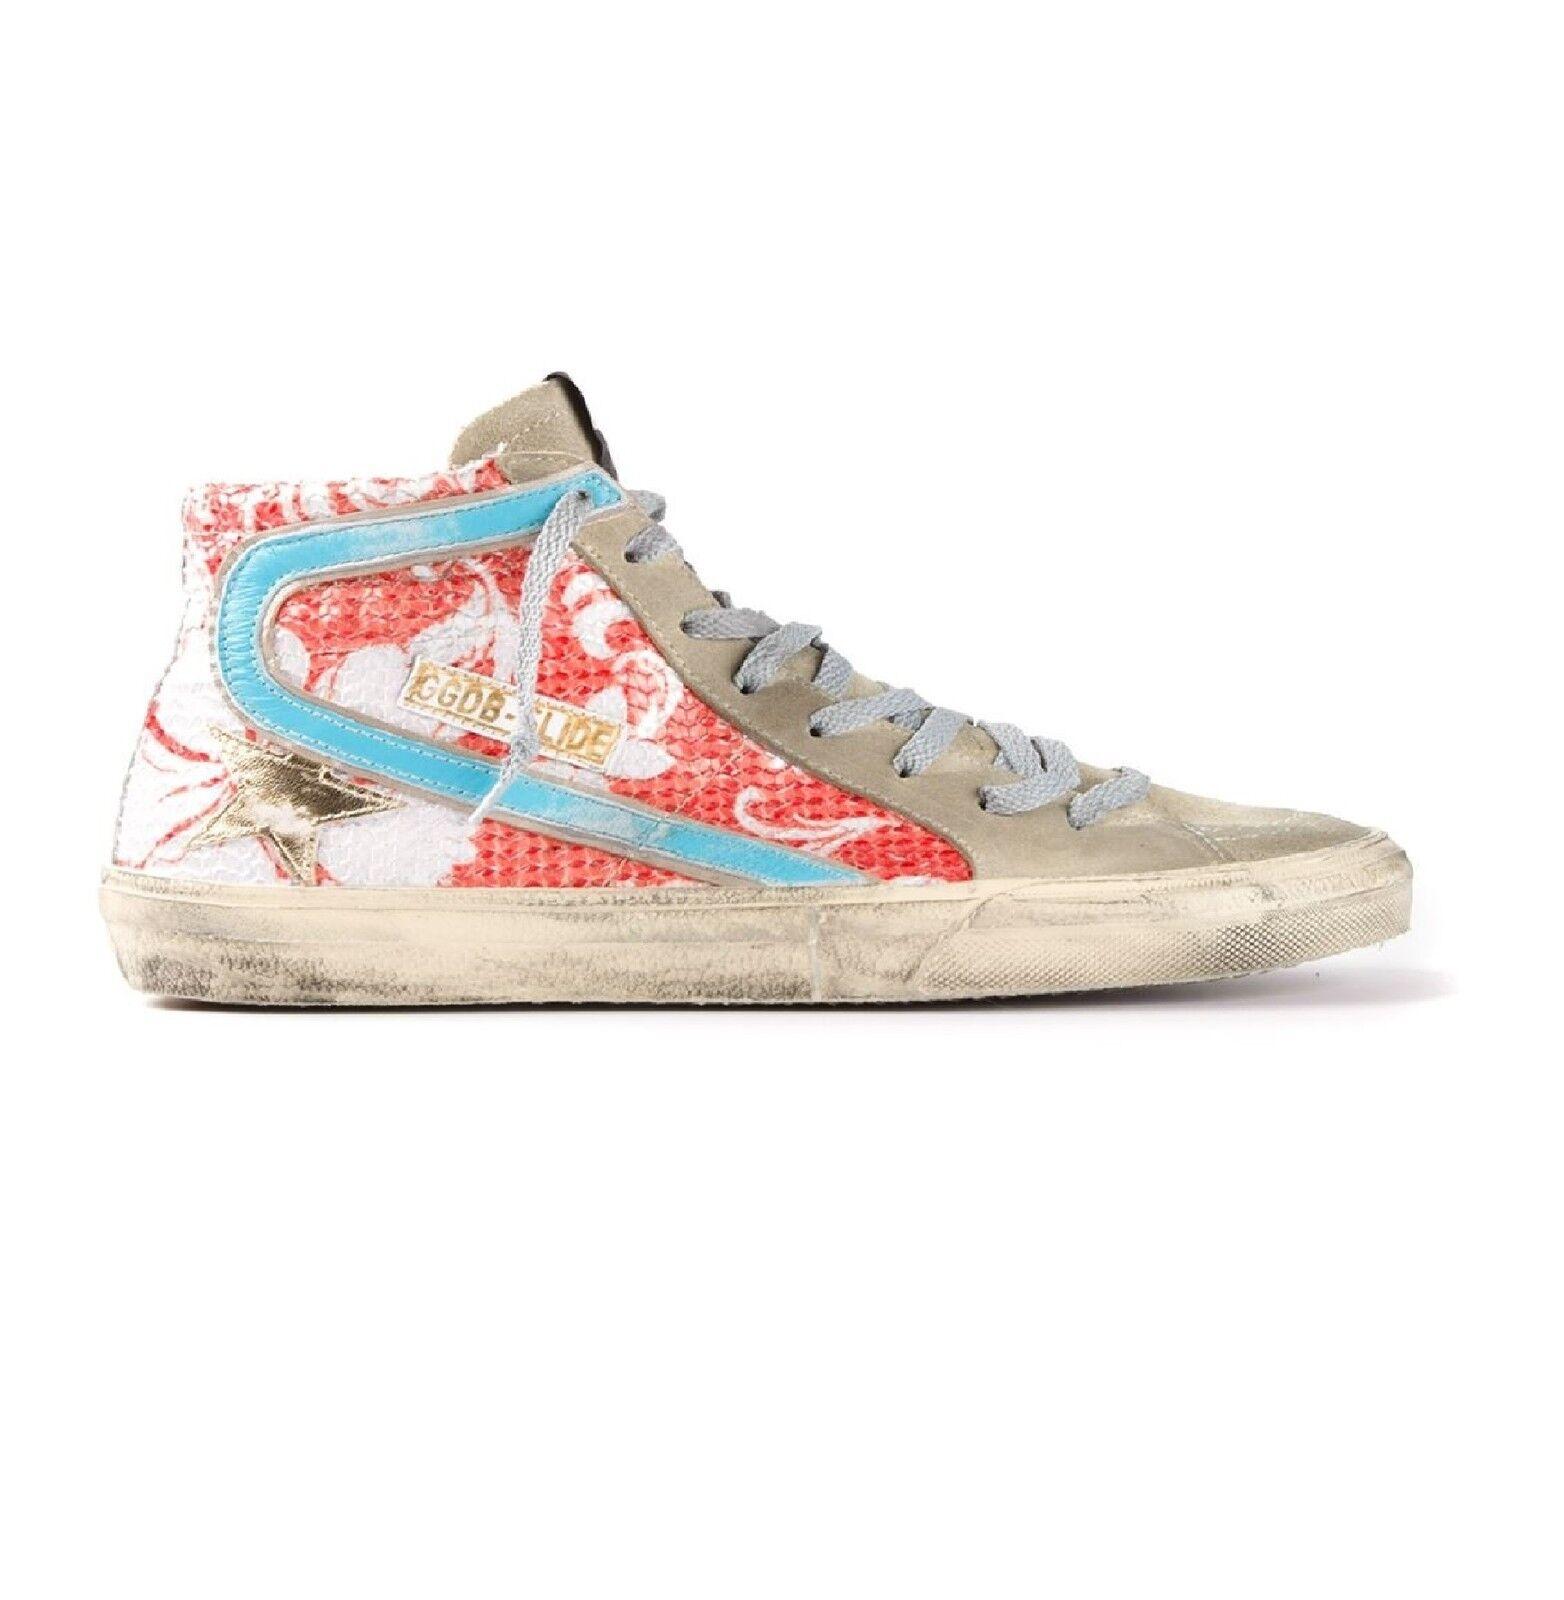 ORIGINAL GOLDEN GOOSE Sneaker GGDB Slide G24D124.H2 Corail Paillettes 35 *NEUF*